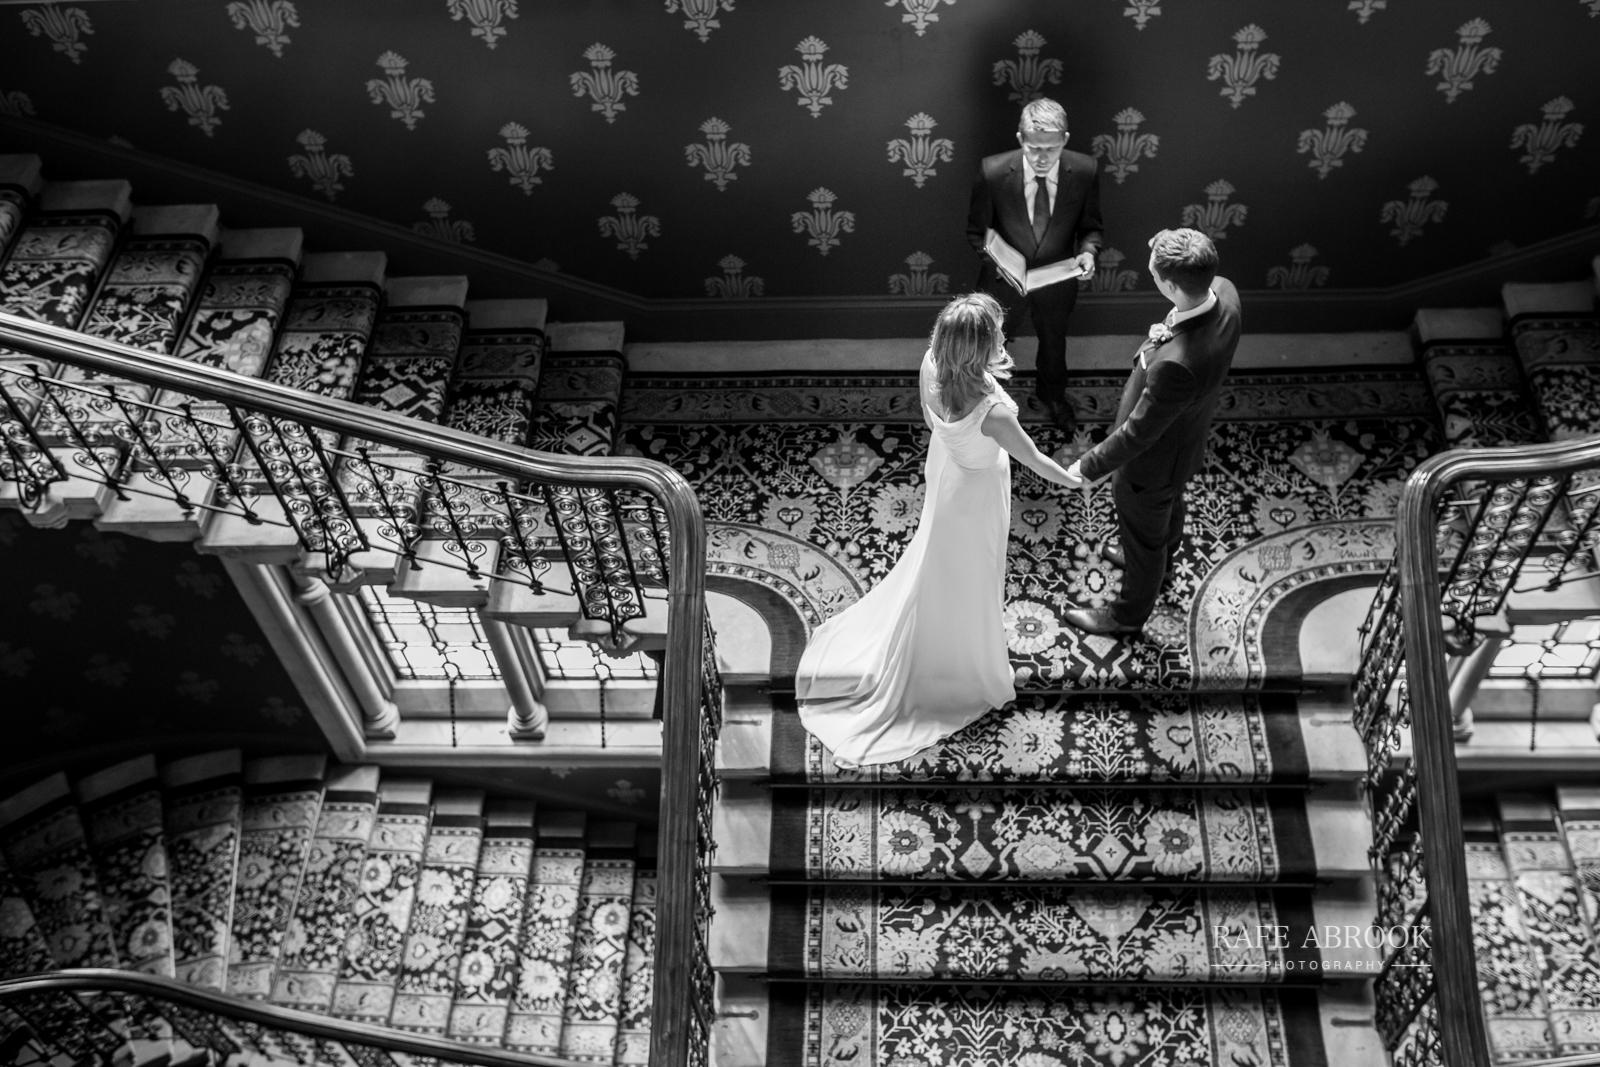 wedding photographer hertfordshire london st pancras renaissance hotel station grand staircase-1067.jpg